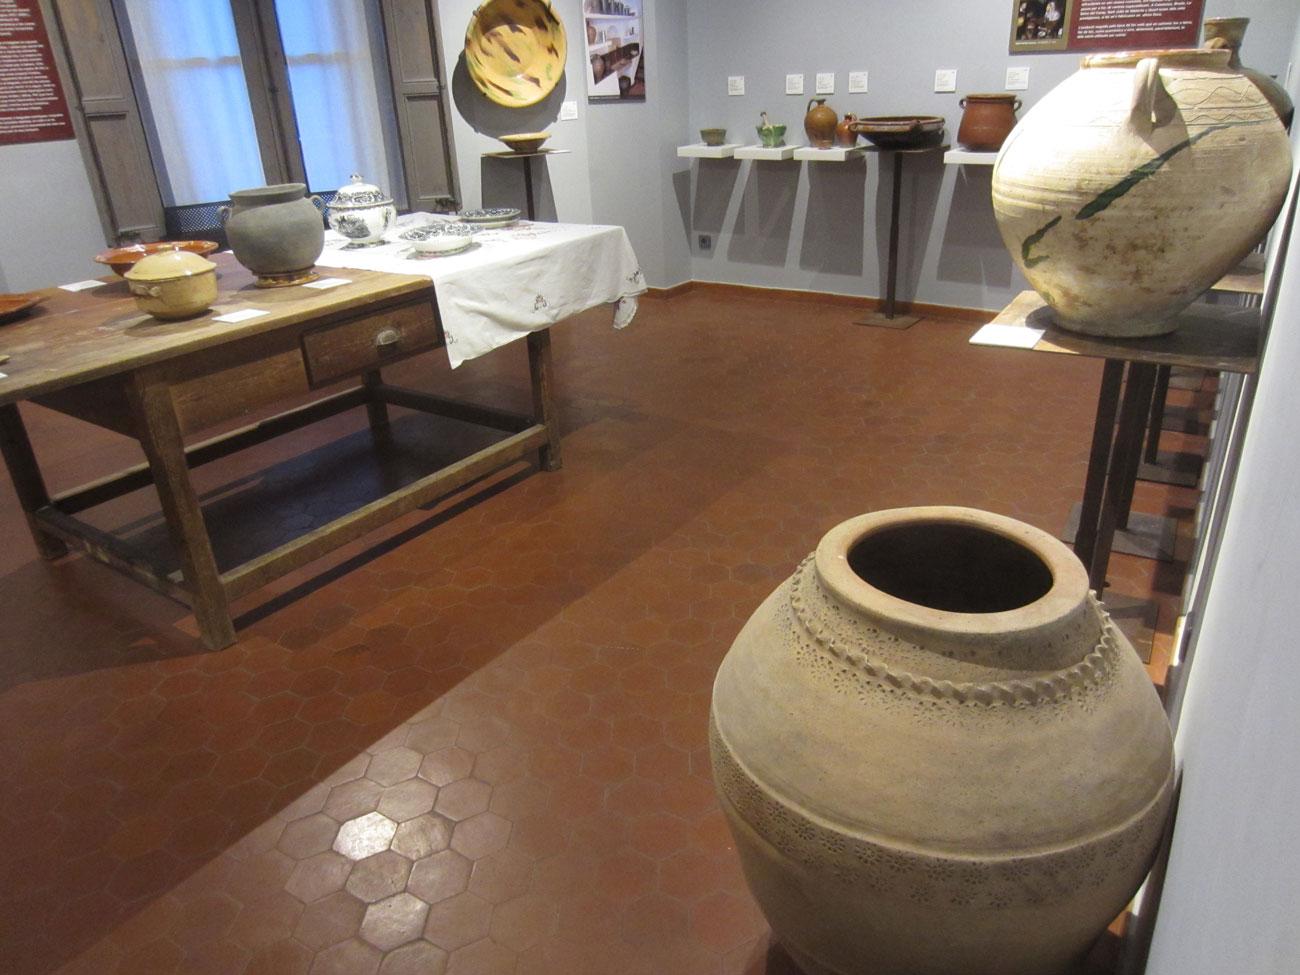 web-alfons-romero-casa-museu-cal-gerrer-fundacio-cabanas-78435